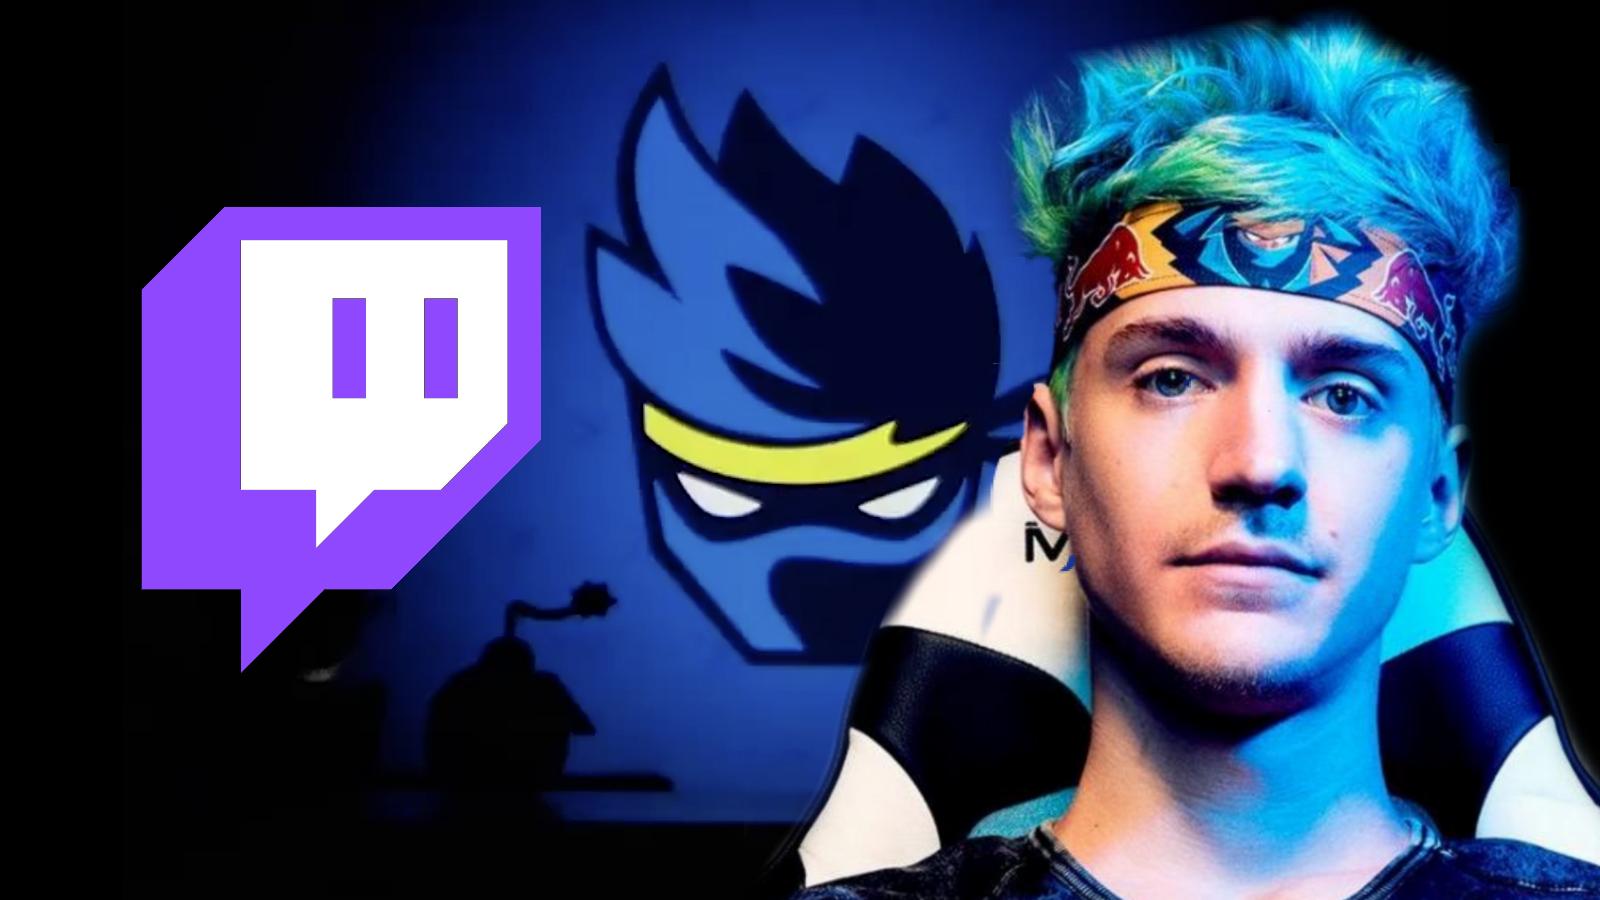 ninja twitch return streaming mixer